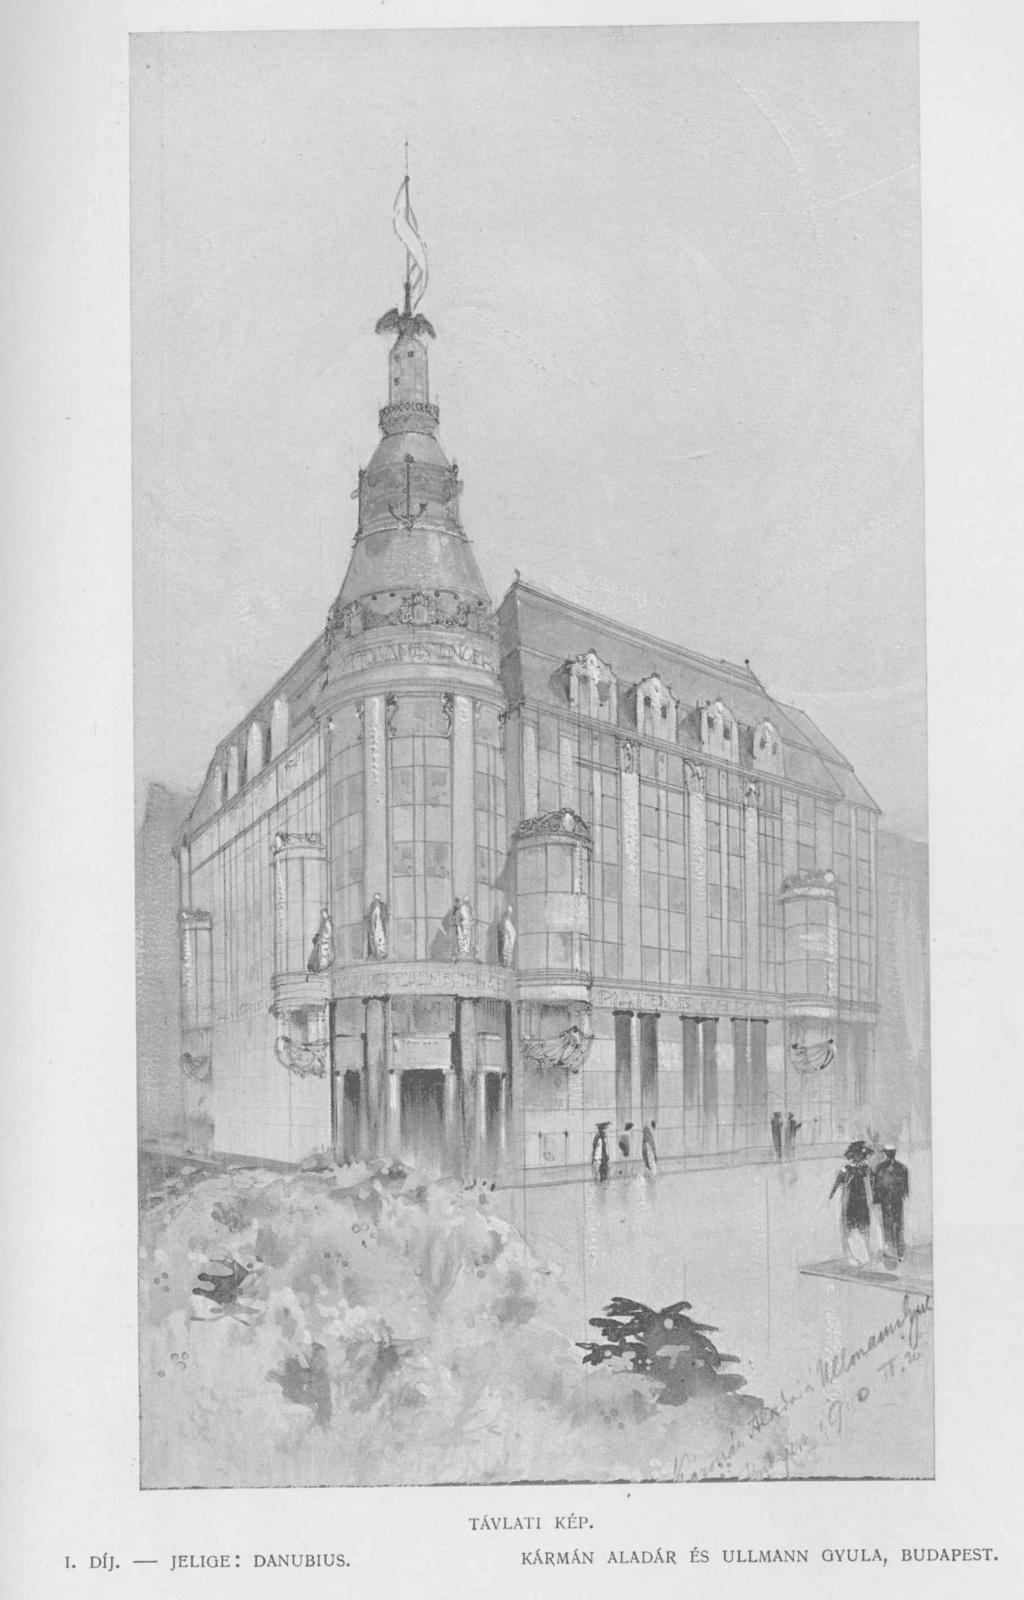 fovarosi.blog.hu: MahartHaz-1910-MagyarEpMuv-04-UllmannGyulaEsKarmanAladar